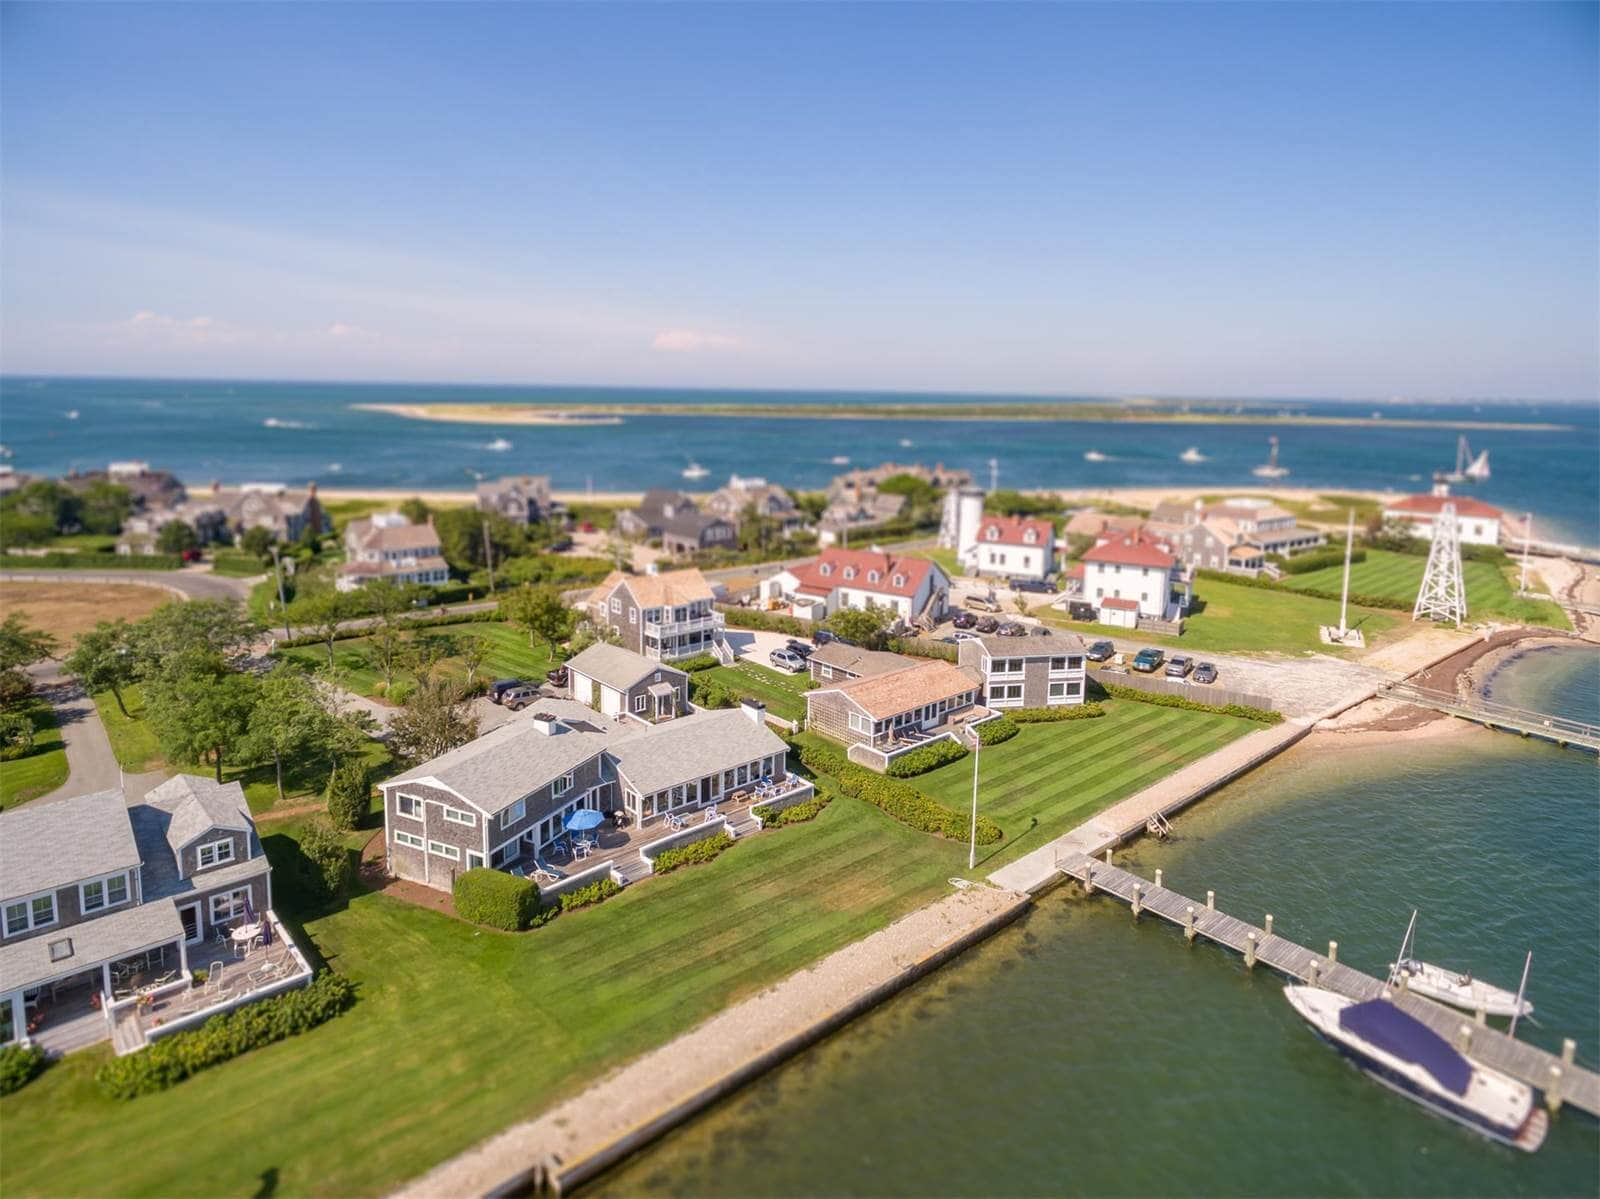 66.Nantucket Experience